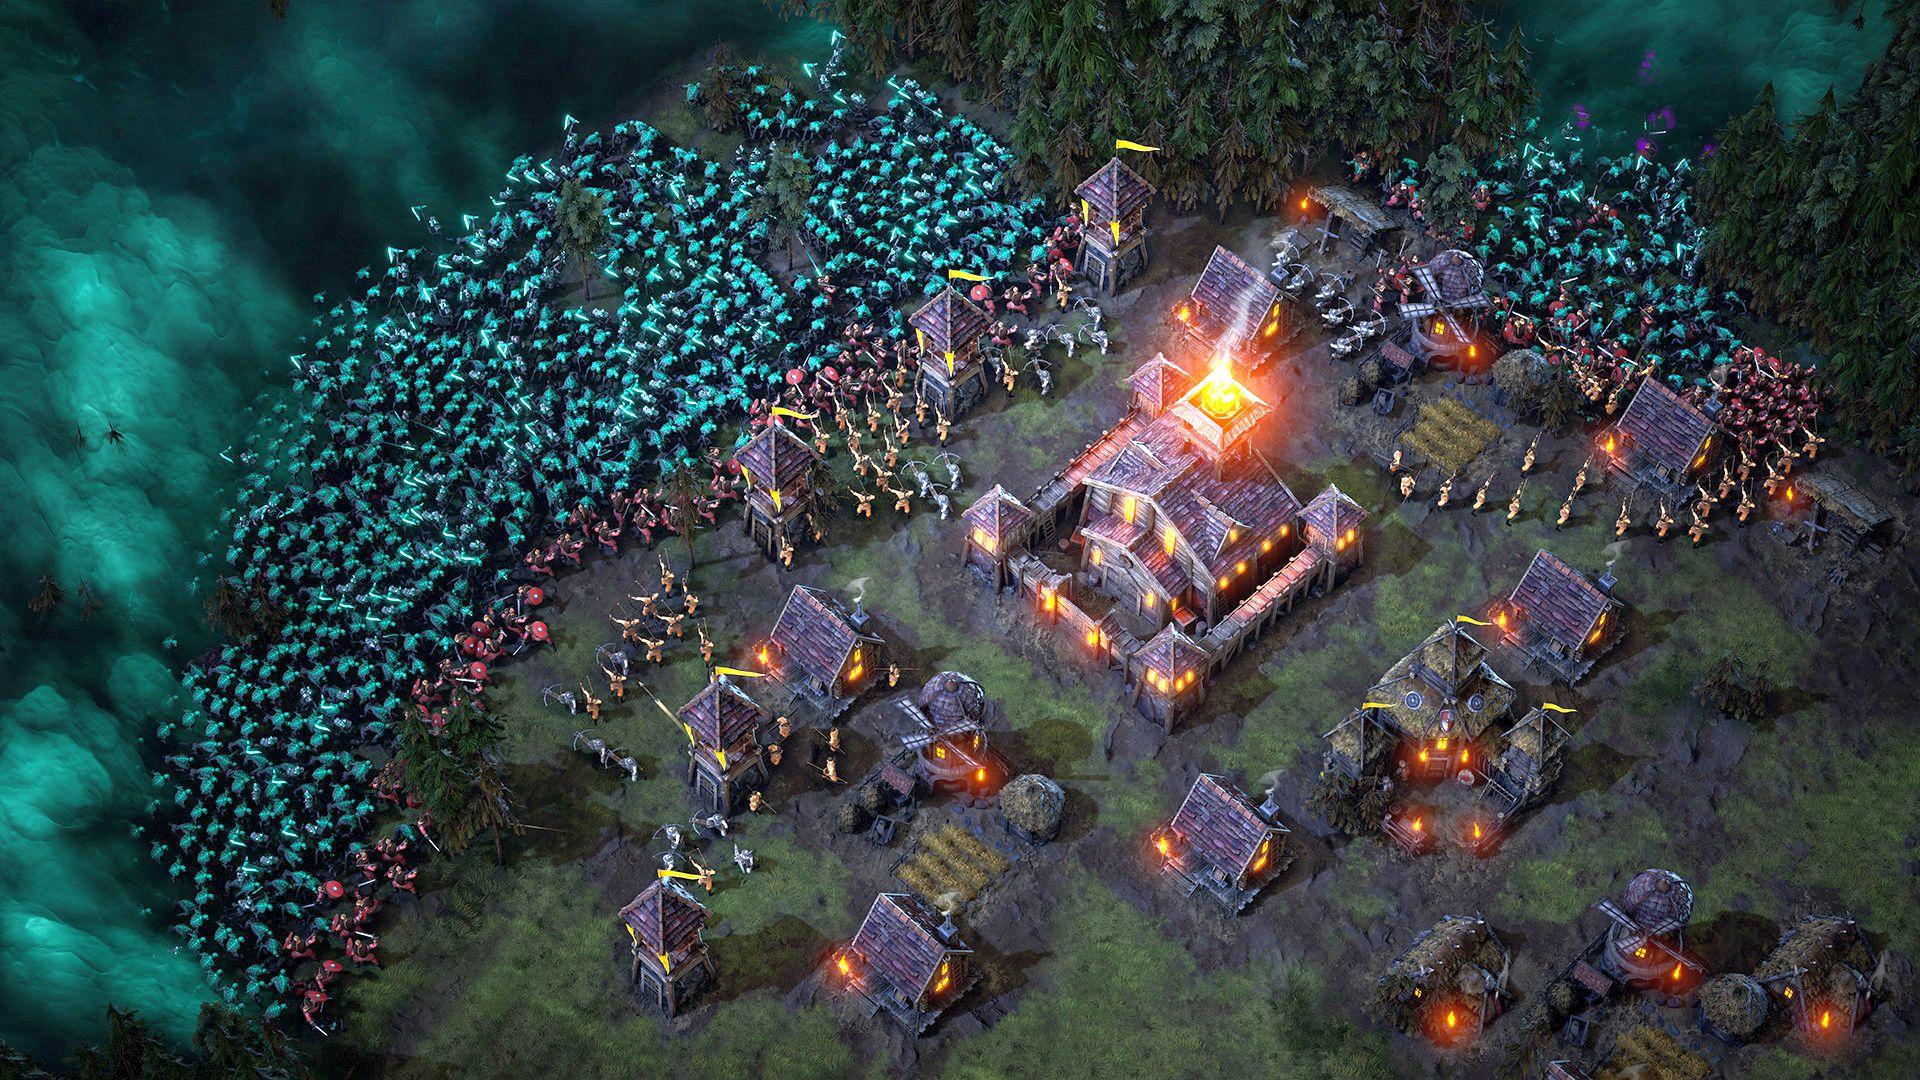 Dark fantasy RTS Age of Darkness: Final Stand hits Steam next month